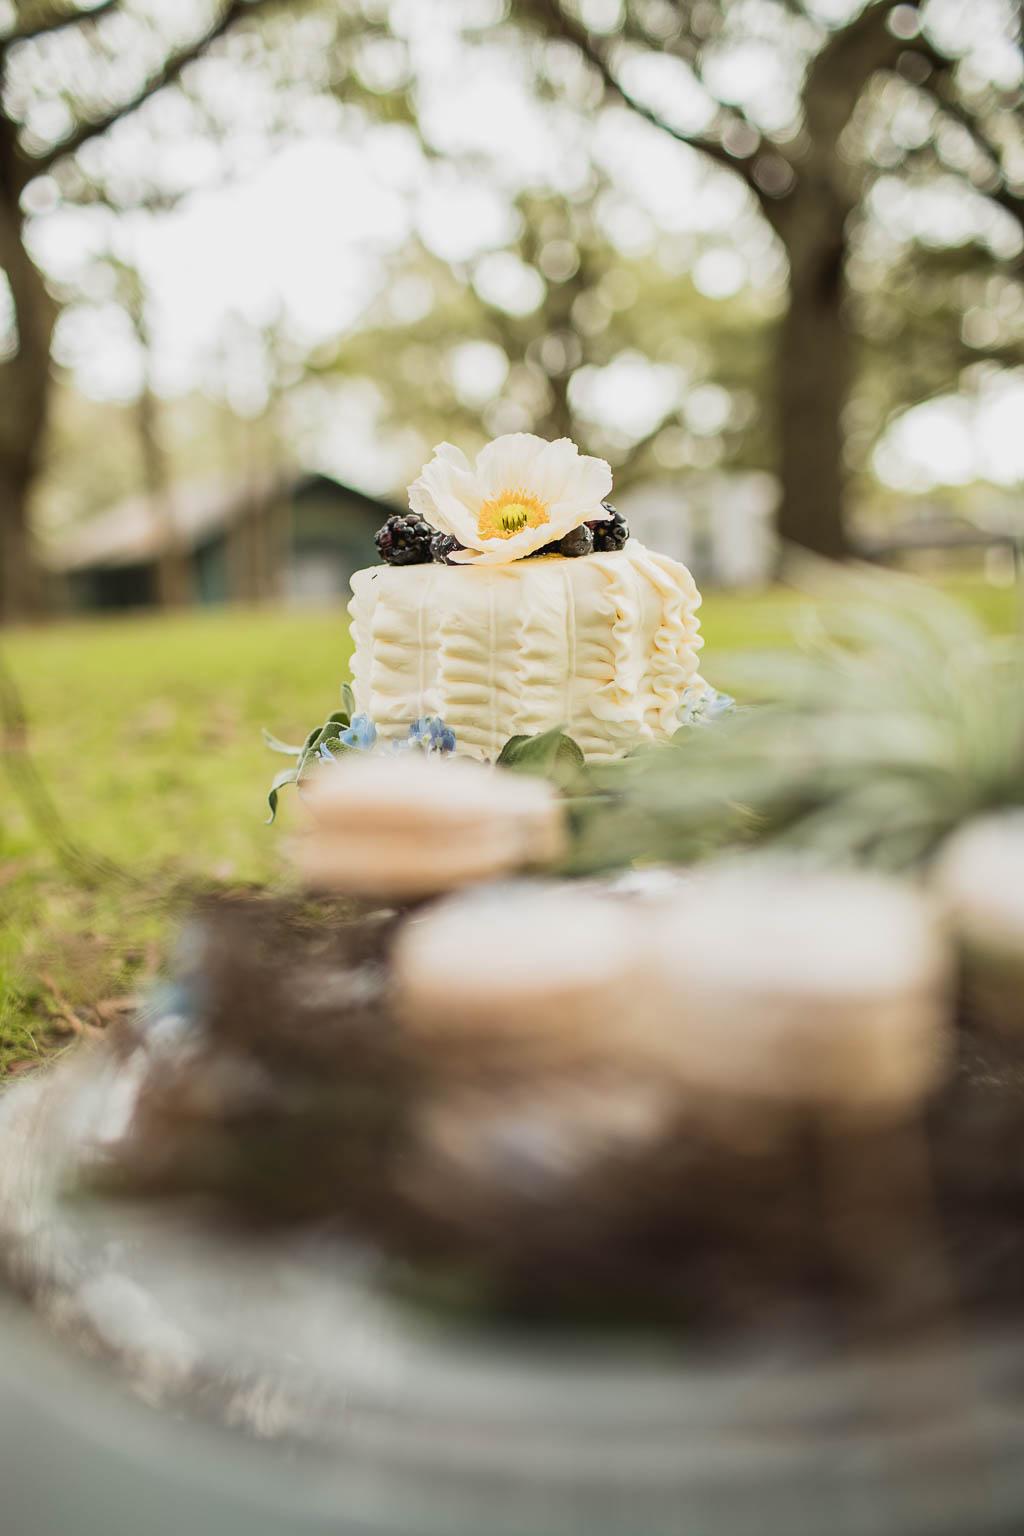 New Orleans Wedding Cake - Bride Film